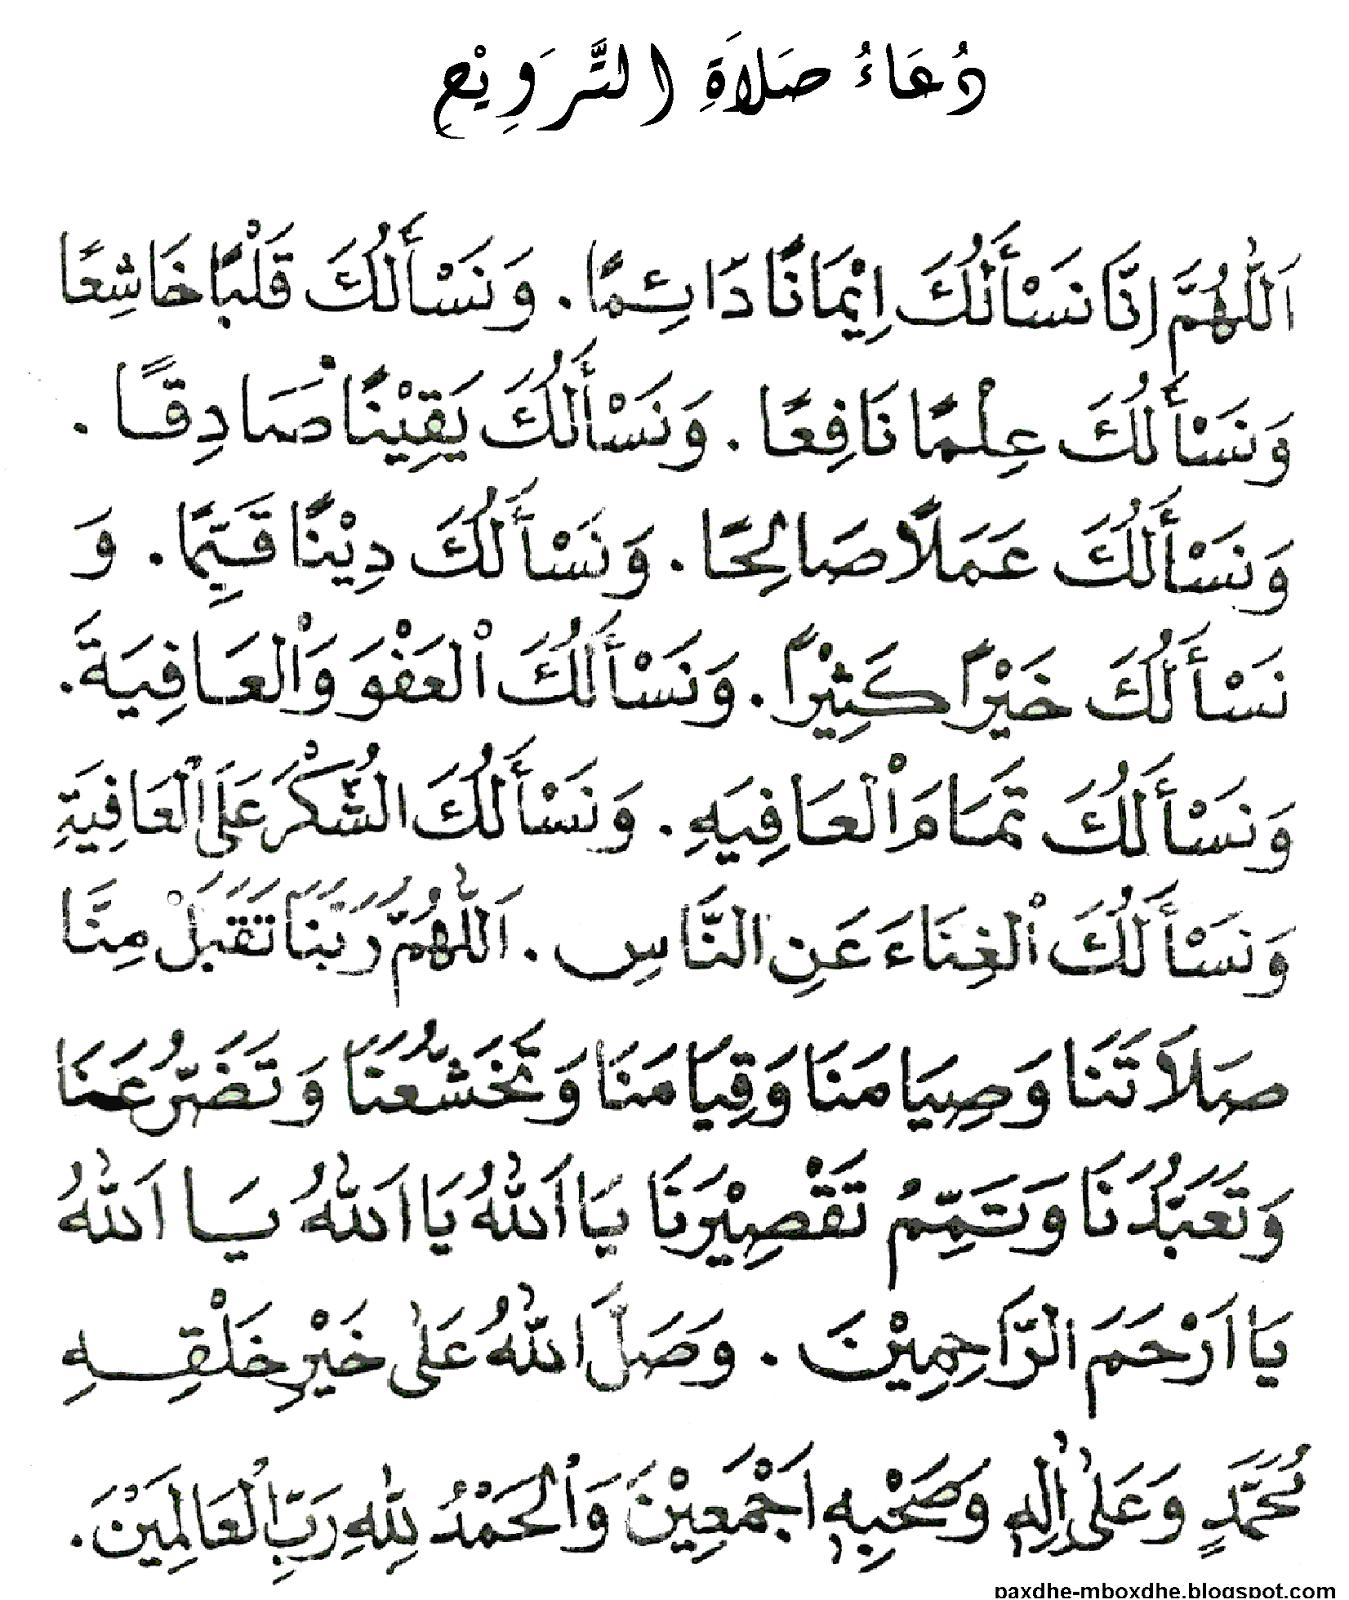 Doa Sholat Tarawih Dan Witir Arab Latin Terjemah